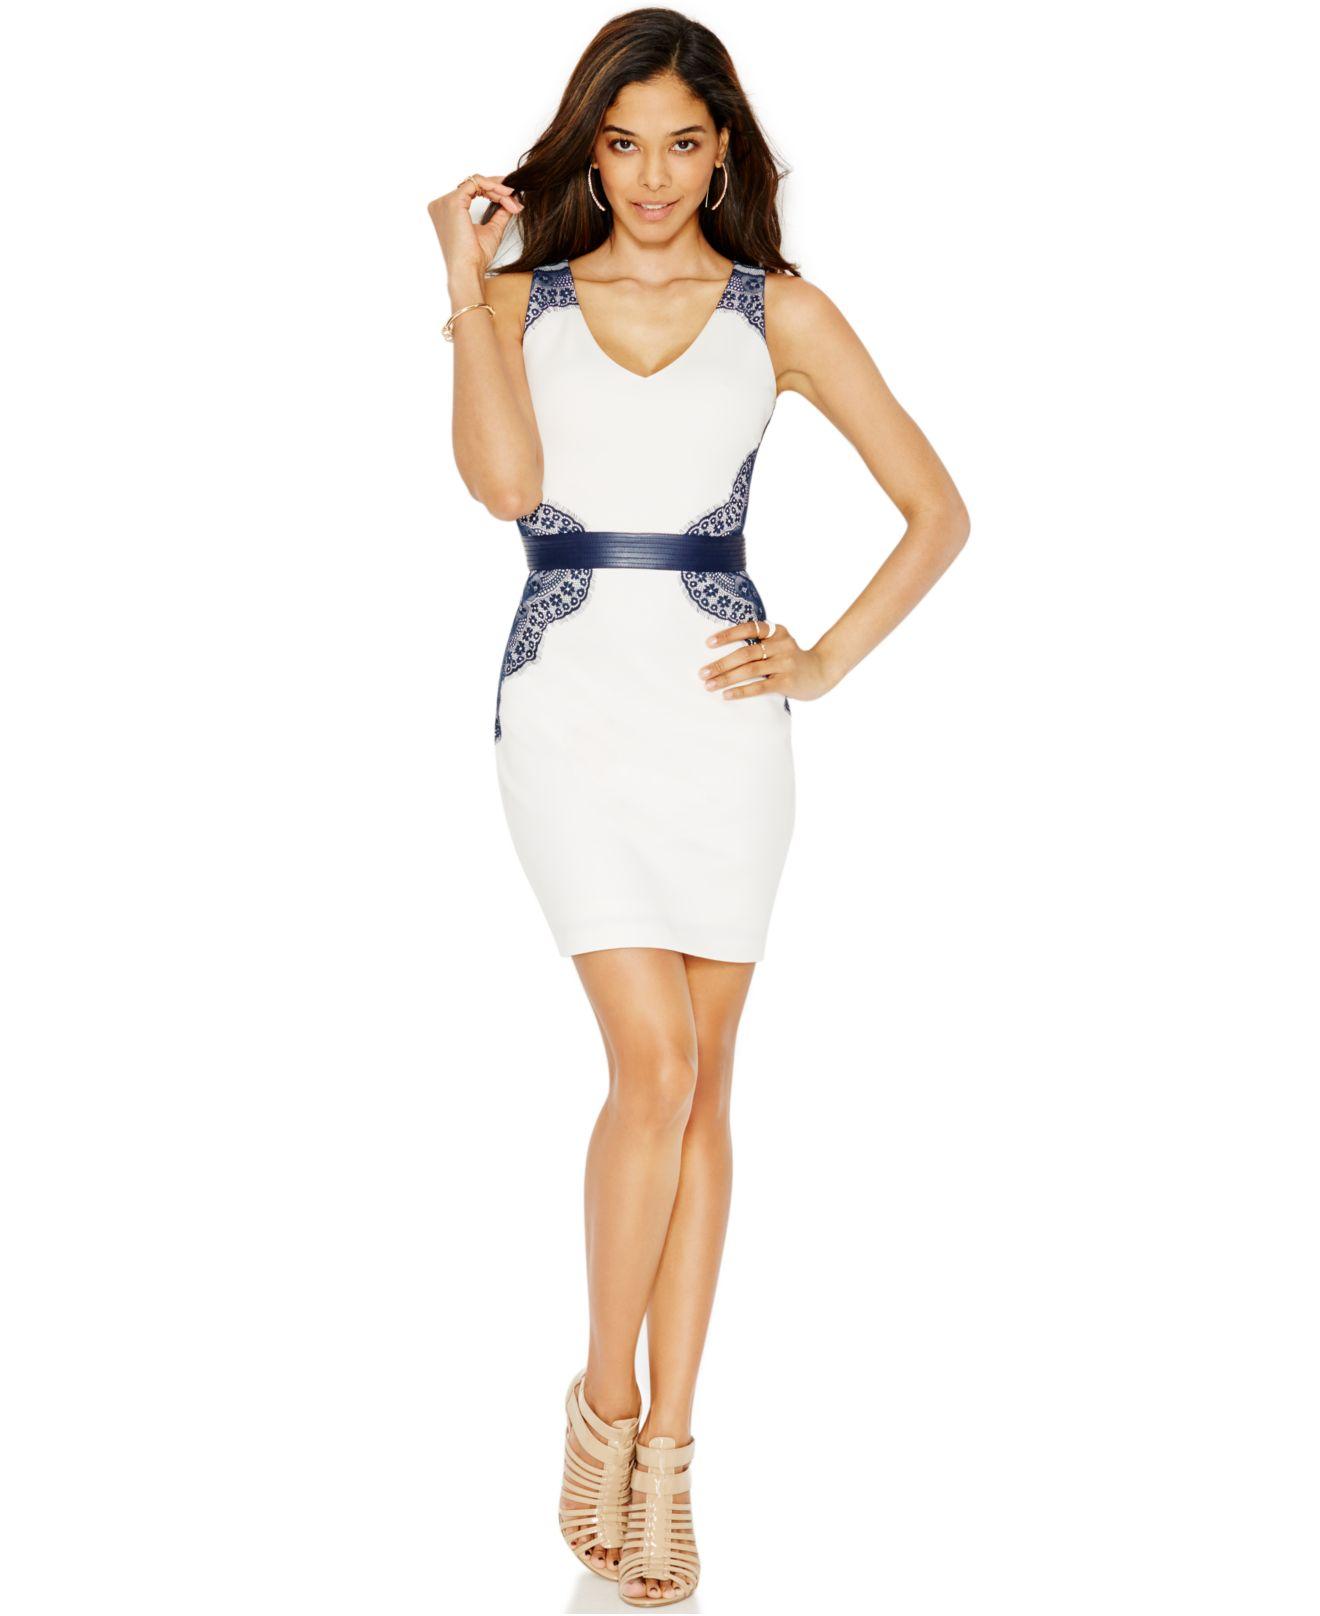 Womens bodycon dresses online